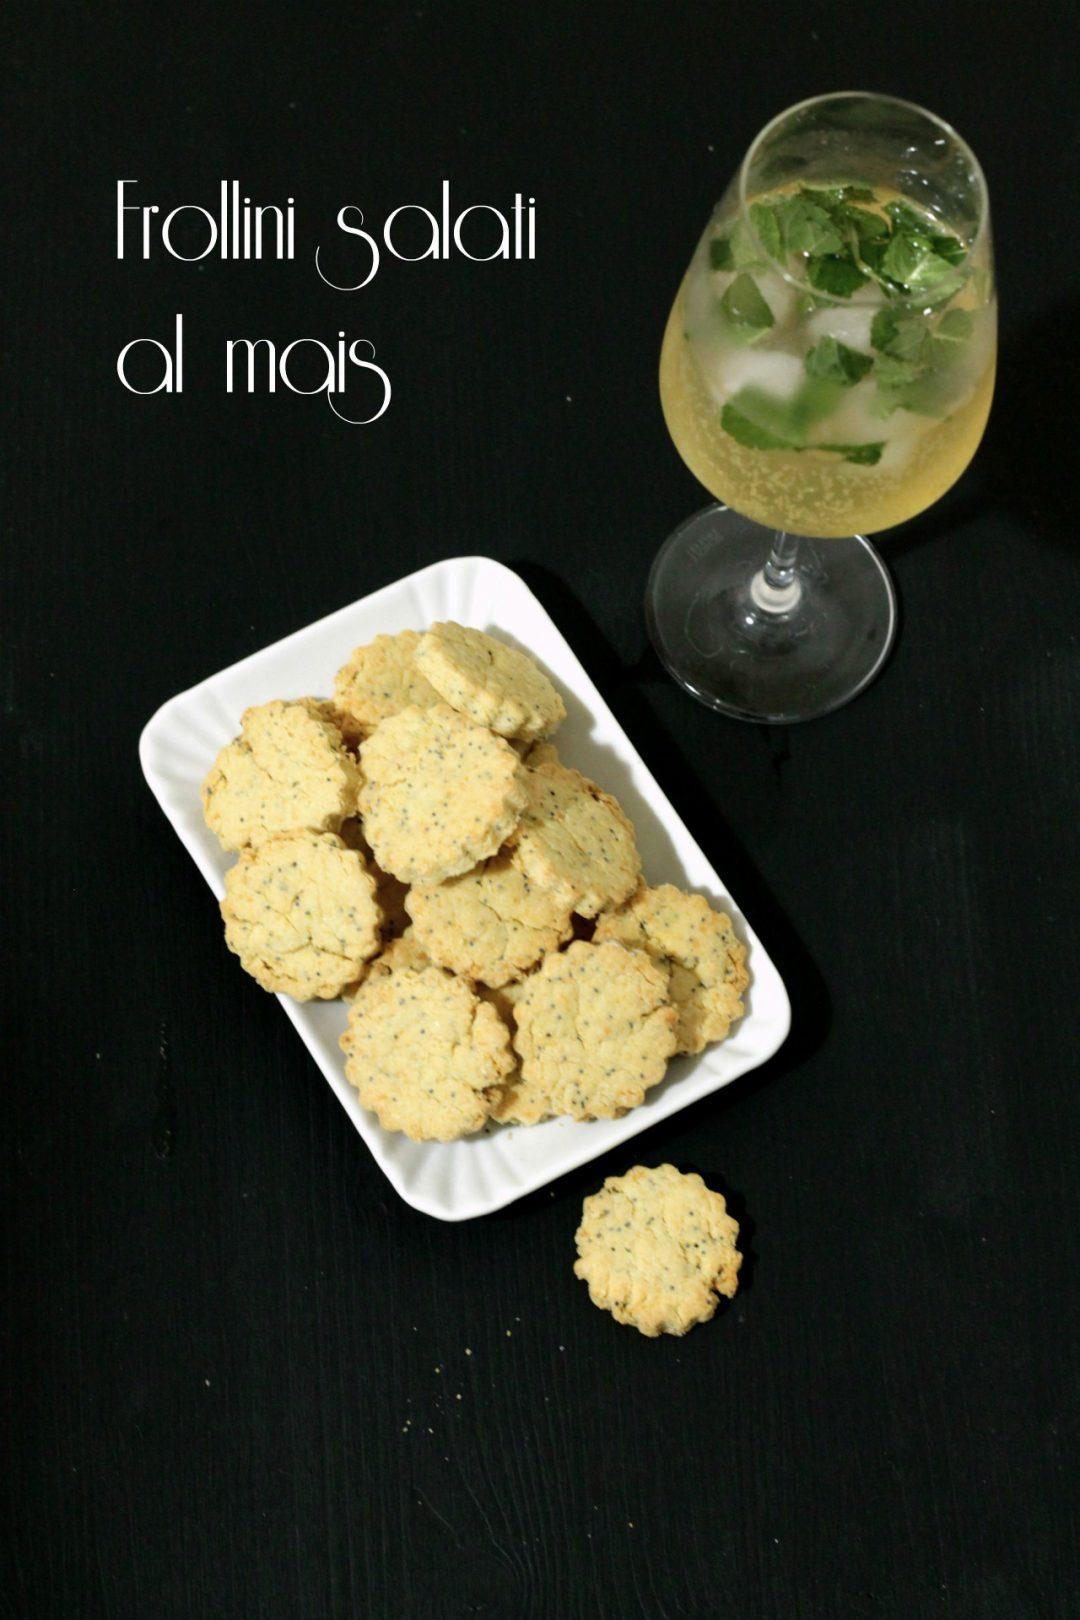 frollini-salati-al-mais